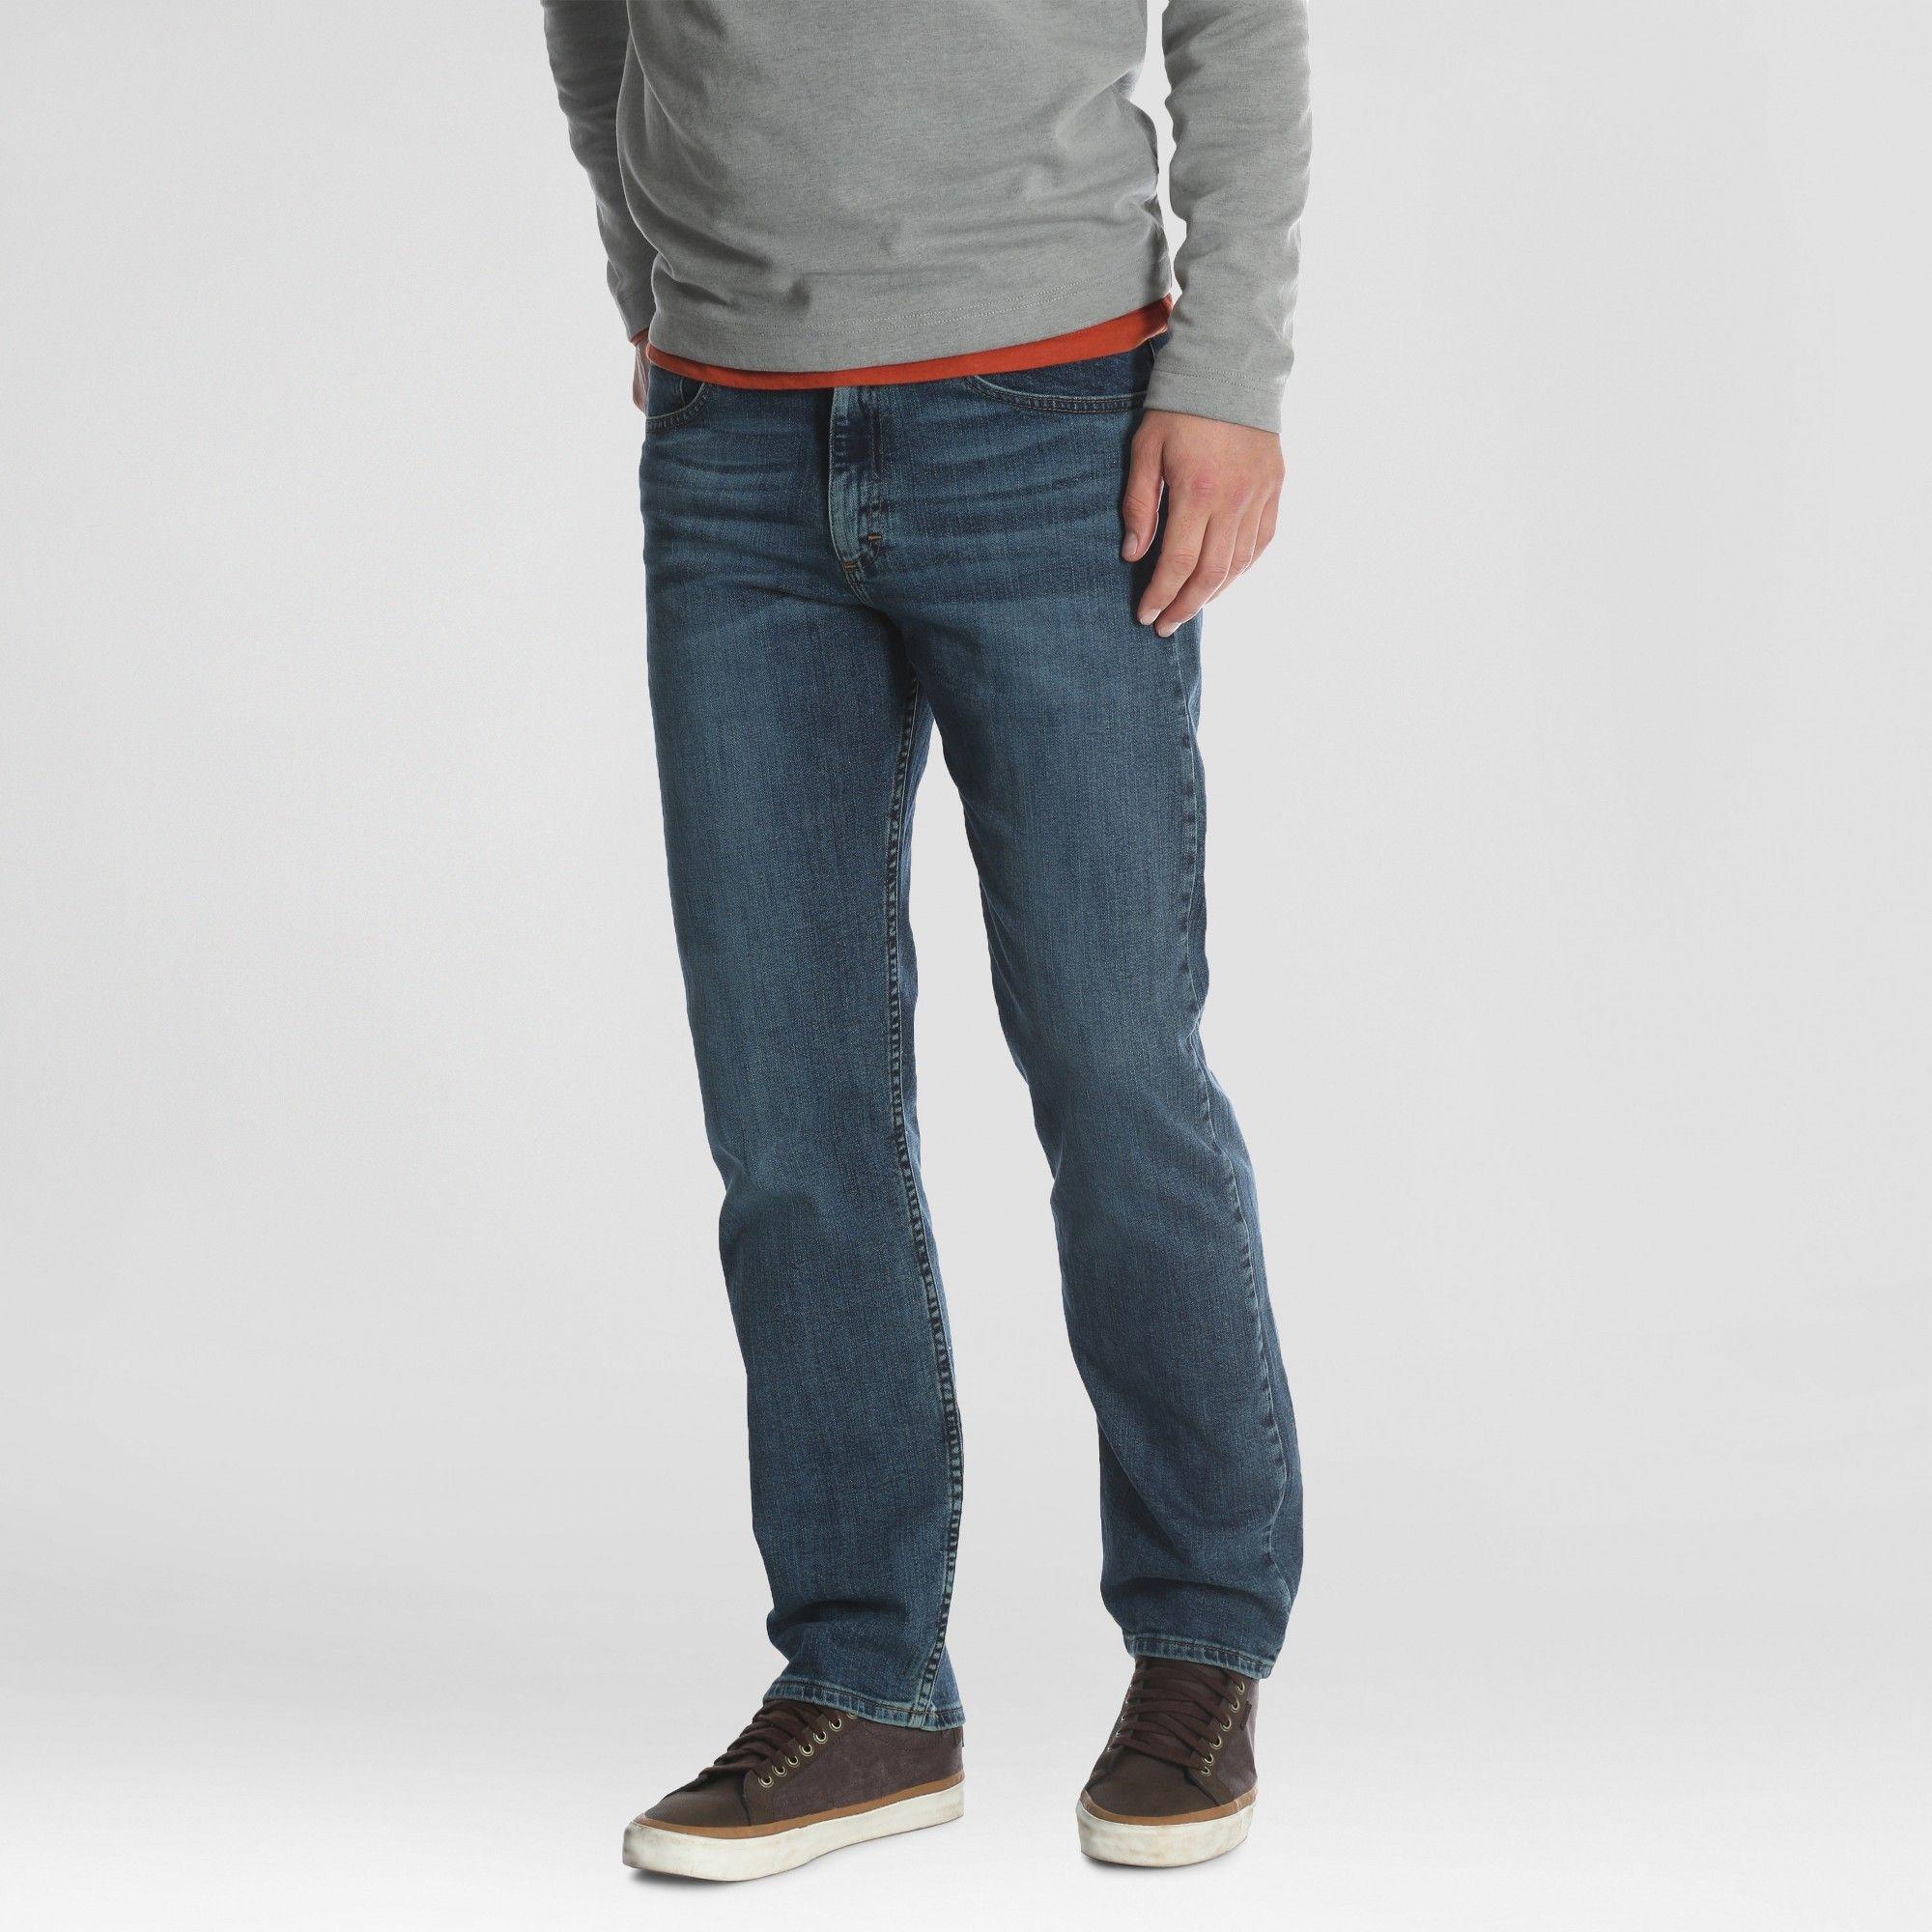 Wrangler NEW Solid Men/'s Performance Series Outdoor Comfort Straight Leg Pants